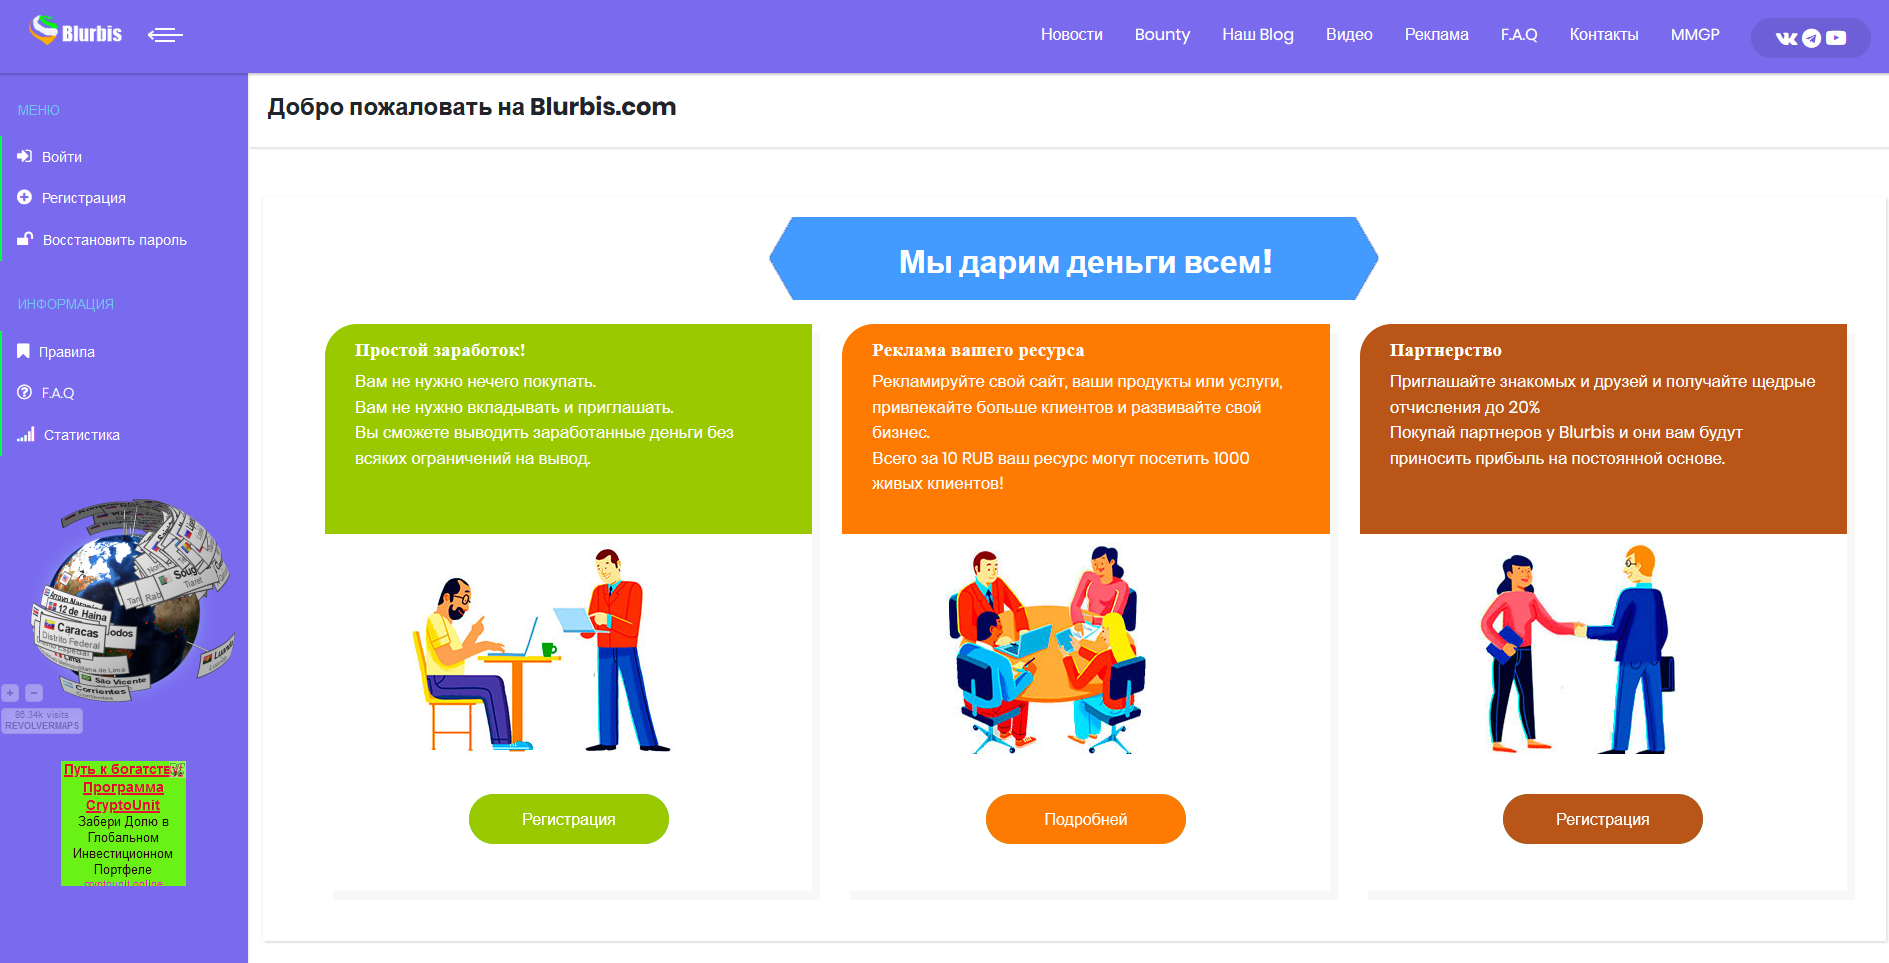 Blurbis - Blurbis.com